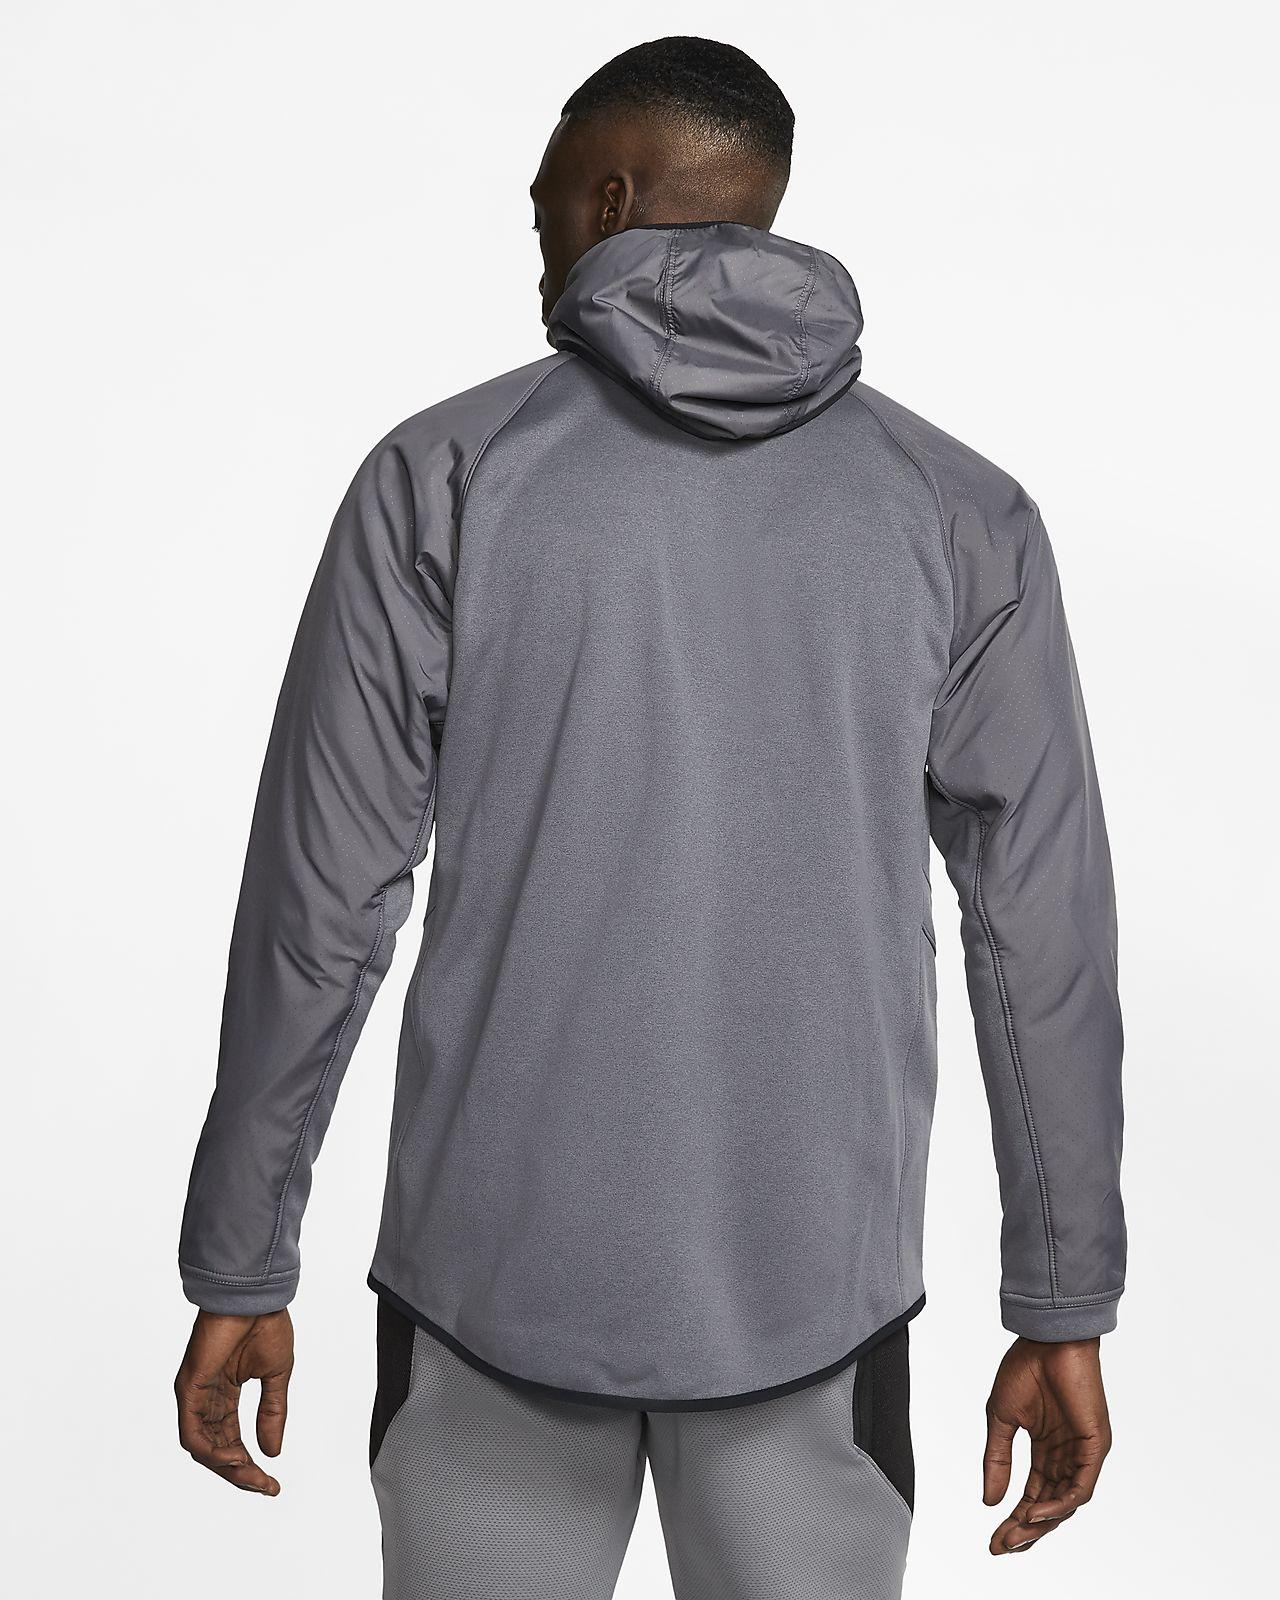 Mens Clothing Nike Therma Full Zip